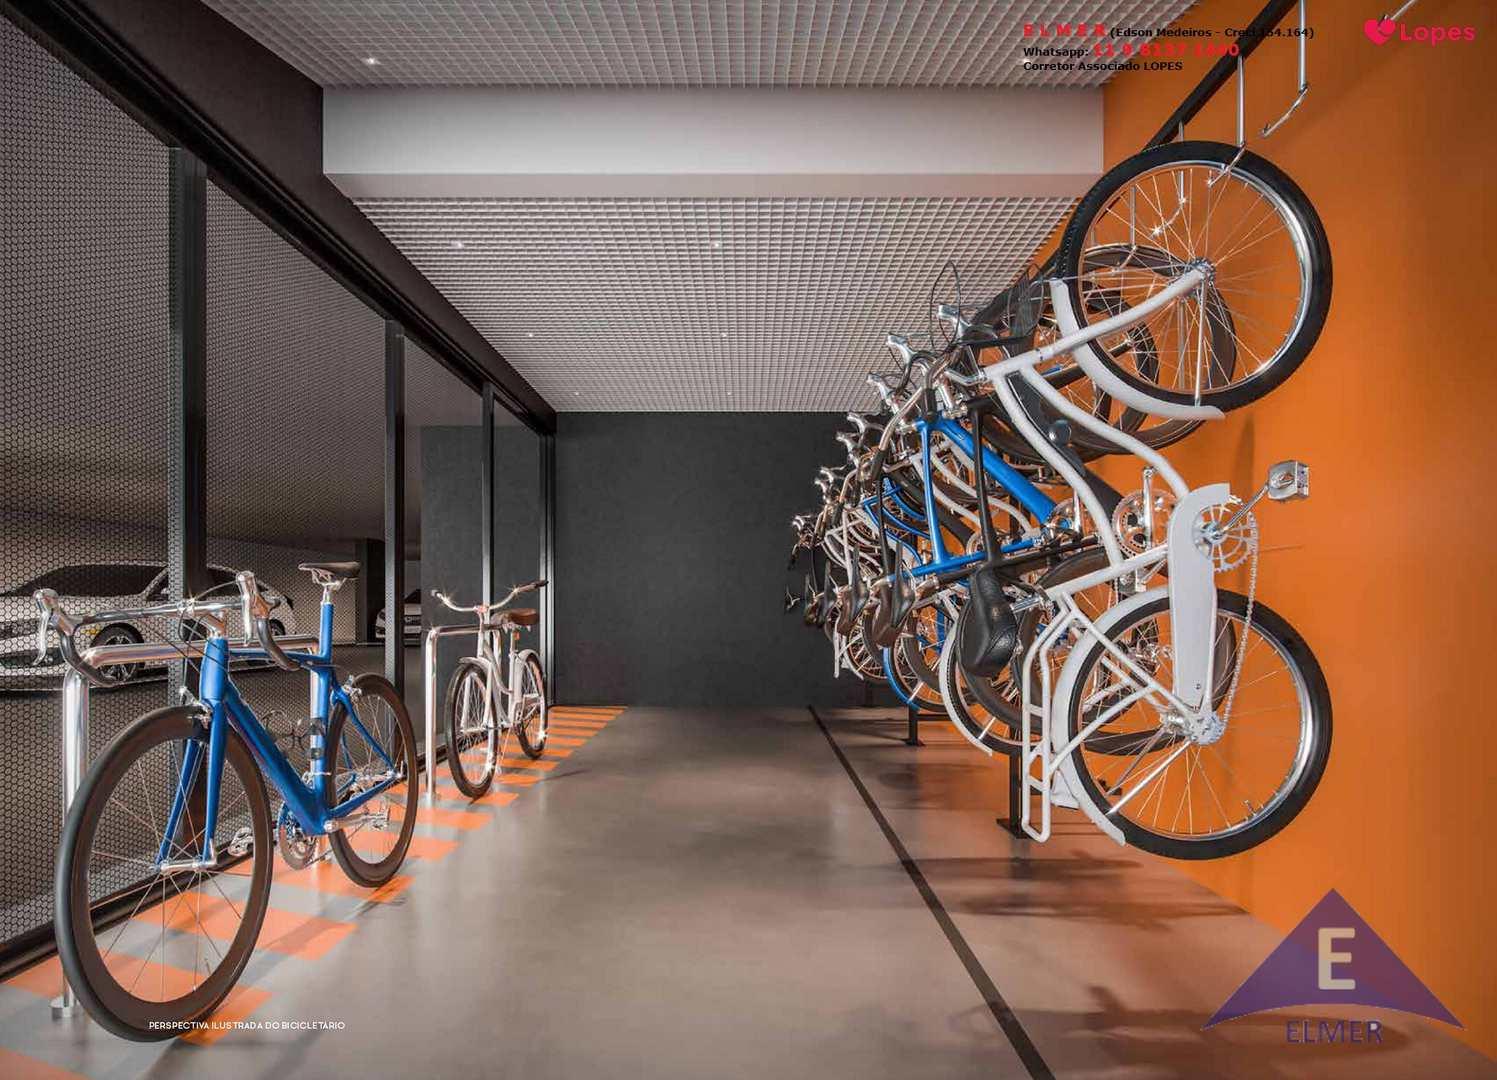 Bicicletario - HARMONIA DA VILA - Elmer